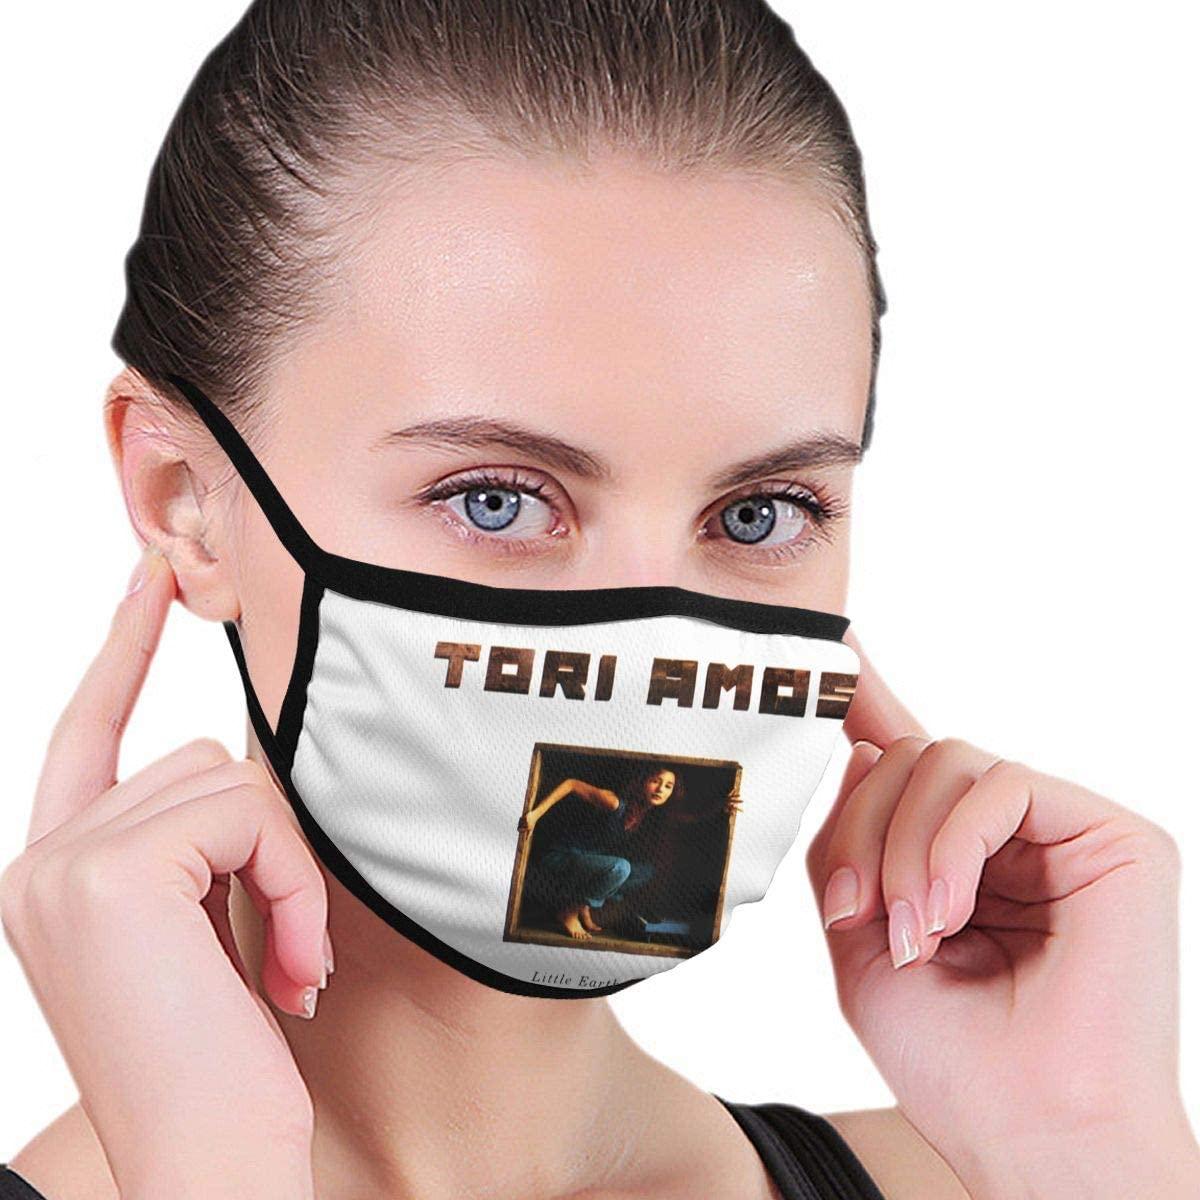 Qwtykeertyi Tori Amos Fashion Protective Reusable Unisex Black Cotton Washable Balaclava